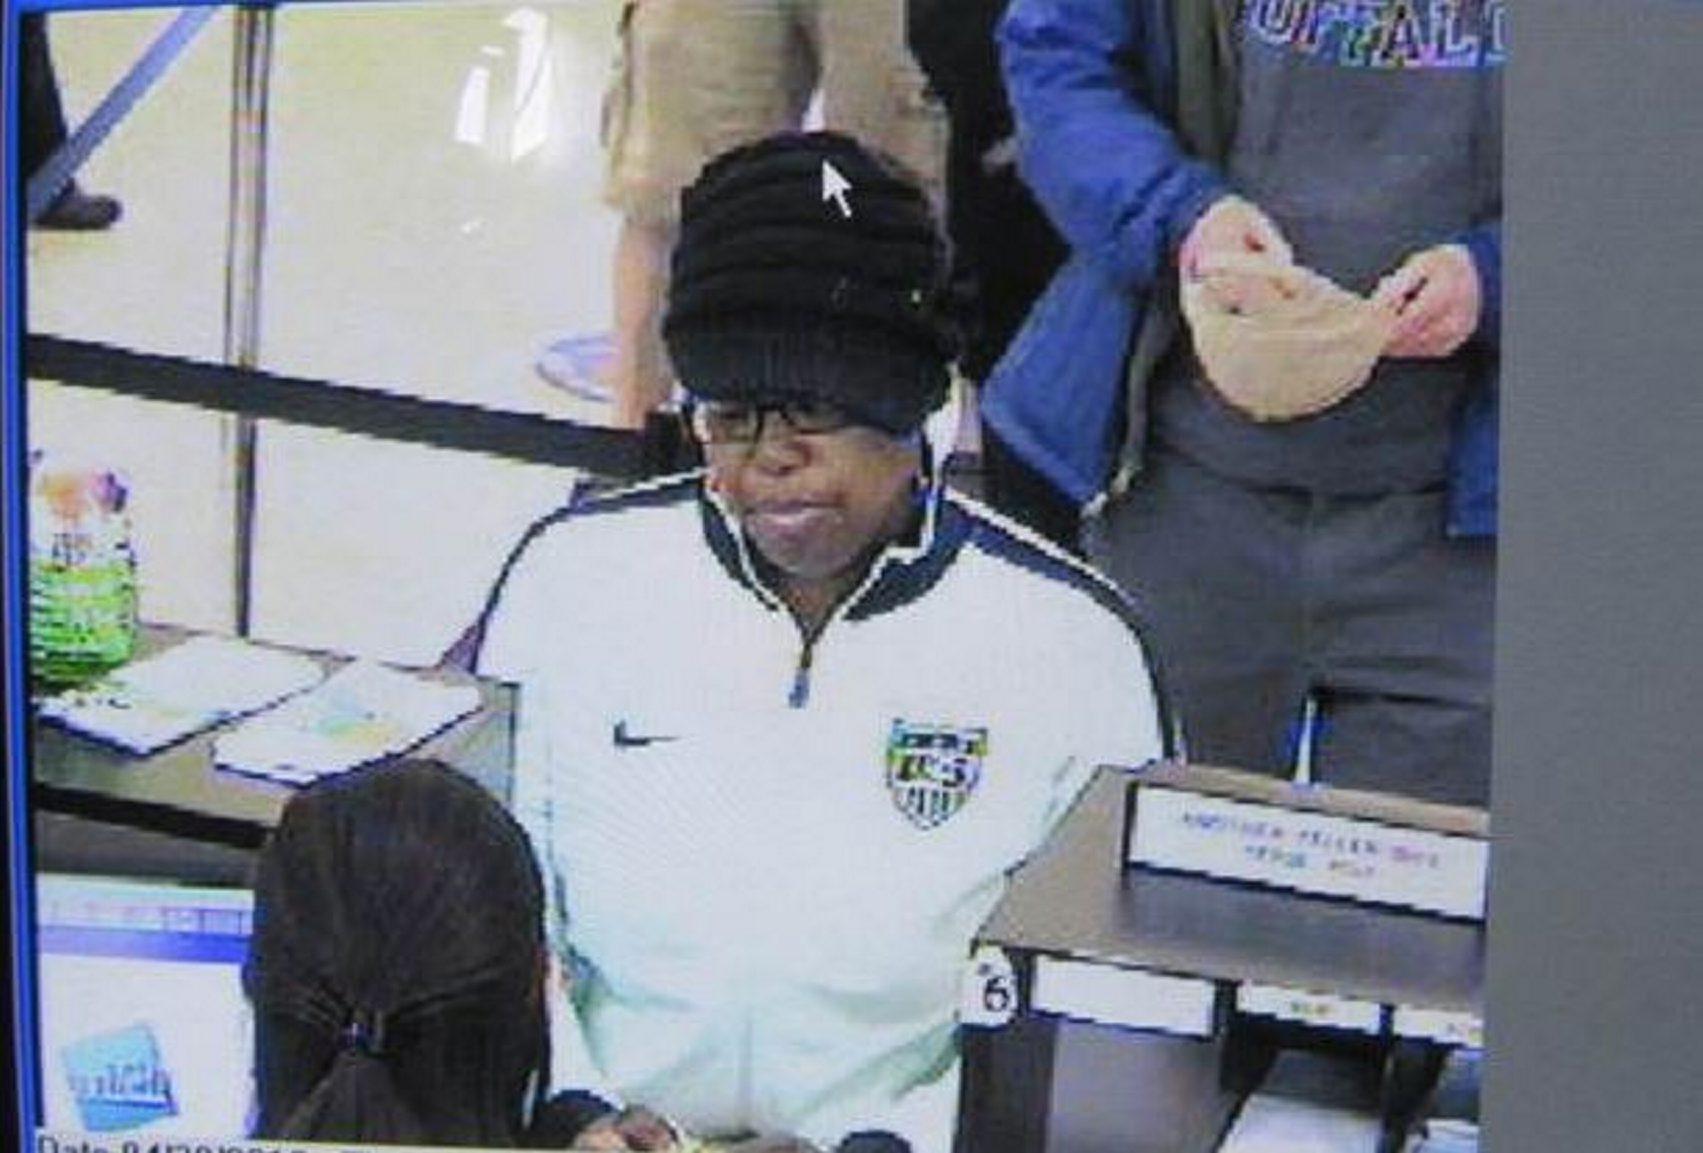 Town of Tonawanda police seek help identifying bank robbery suspect